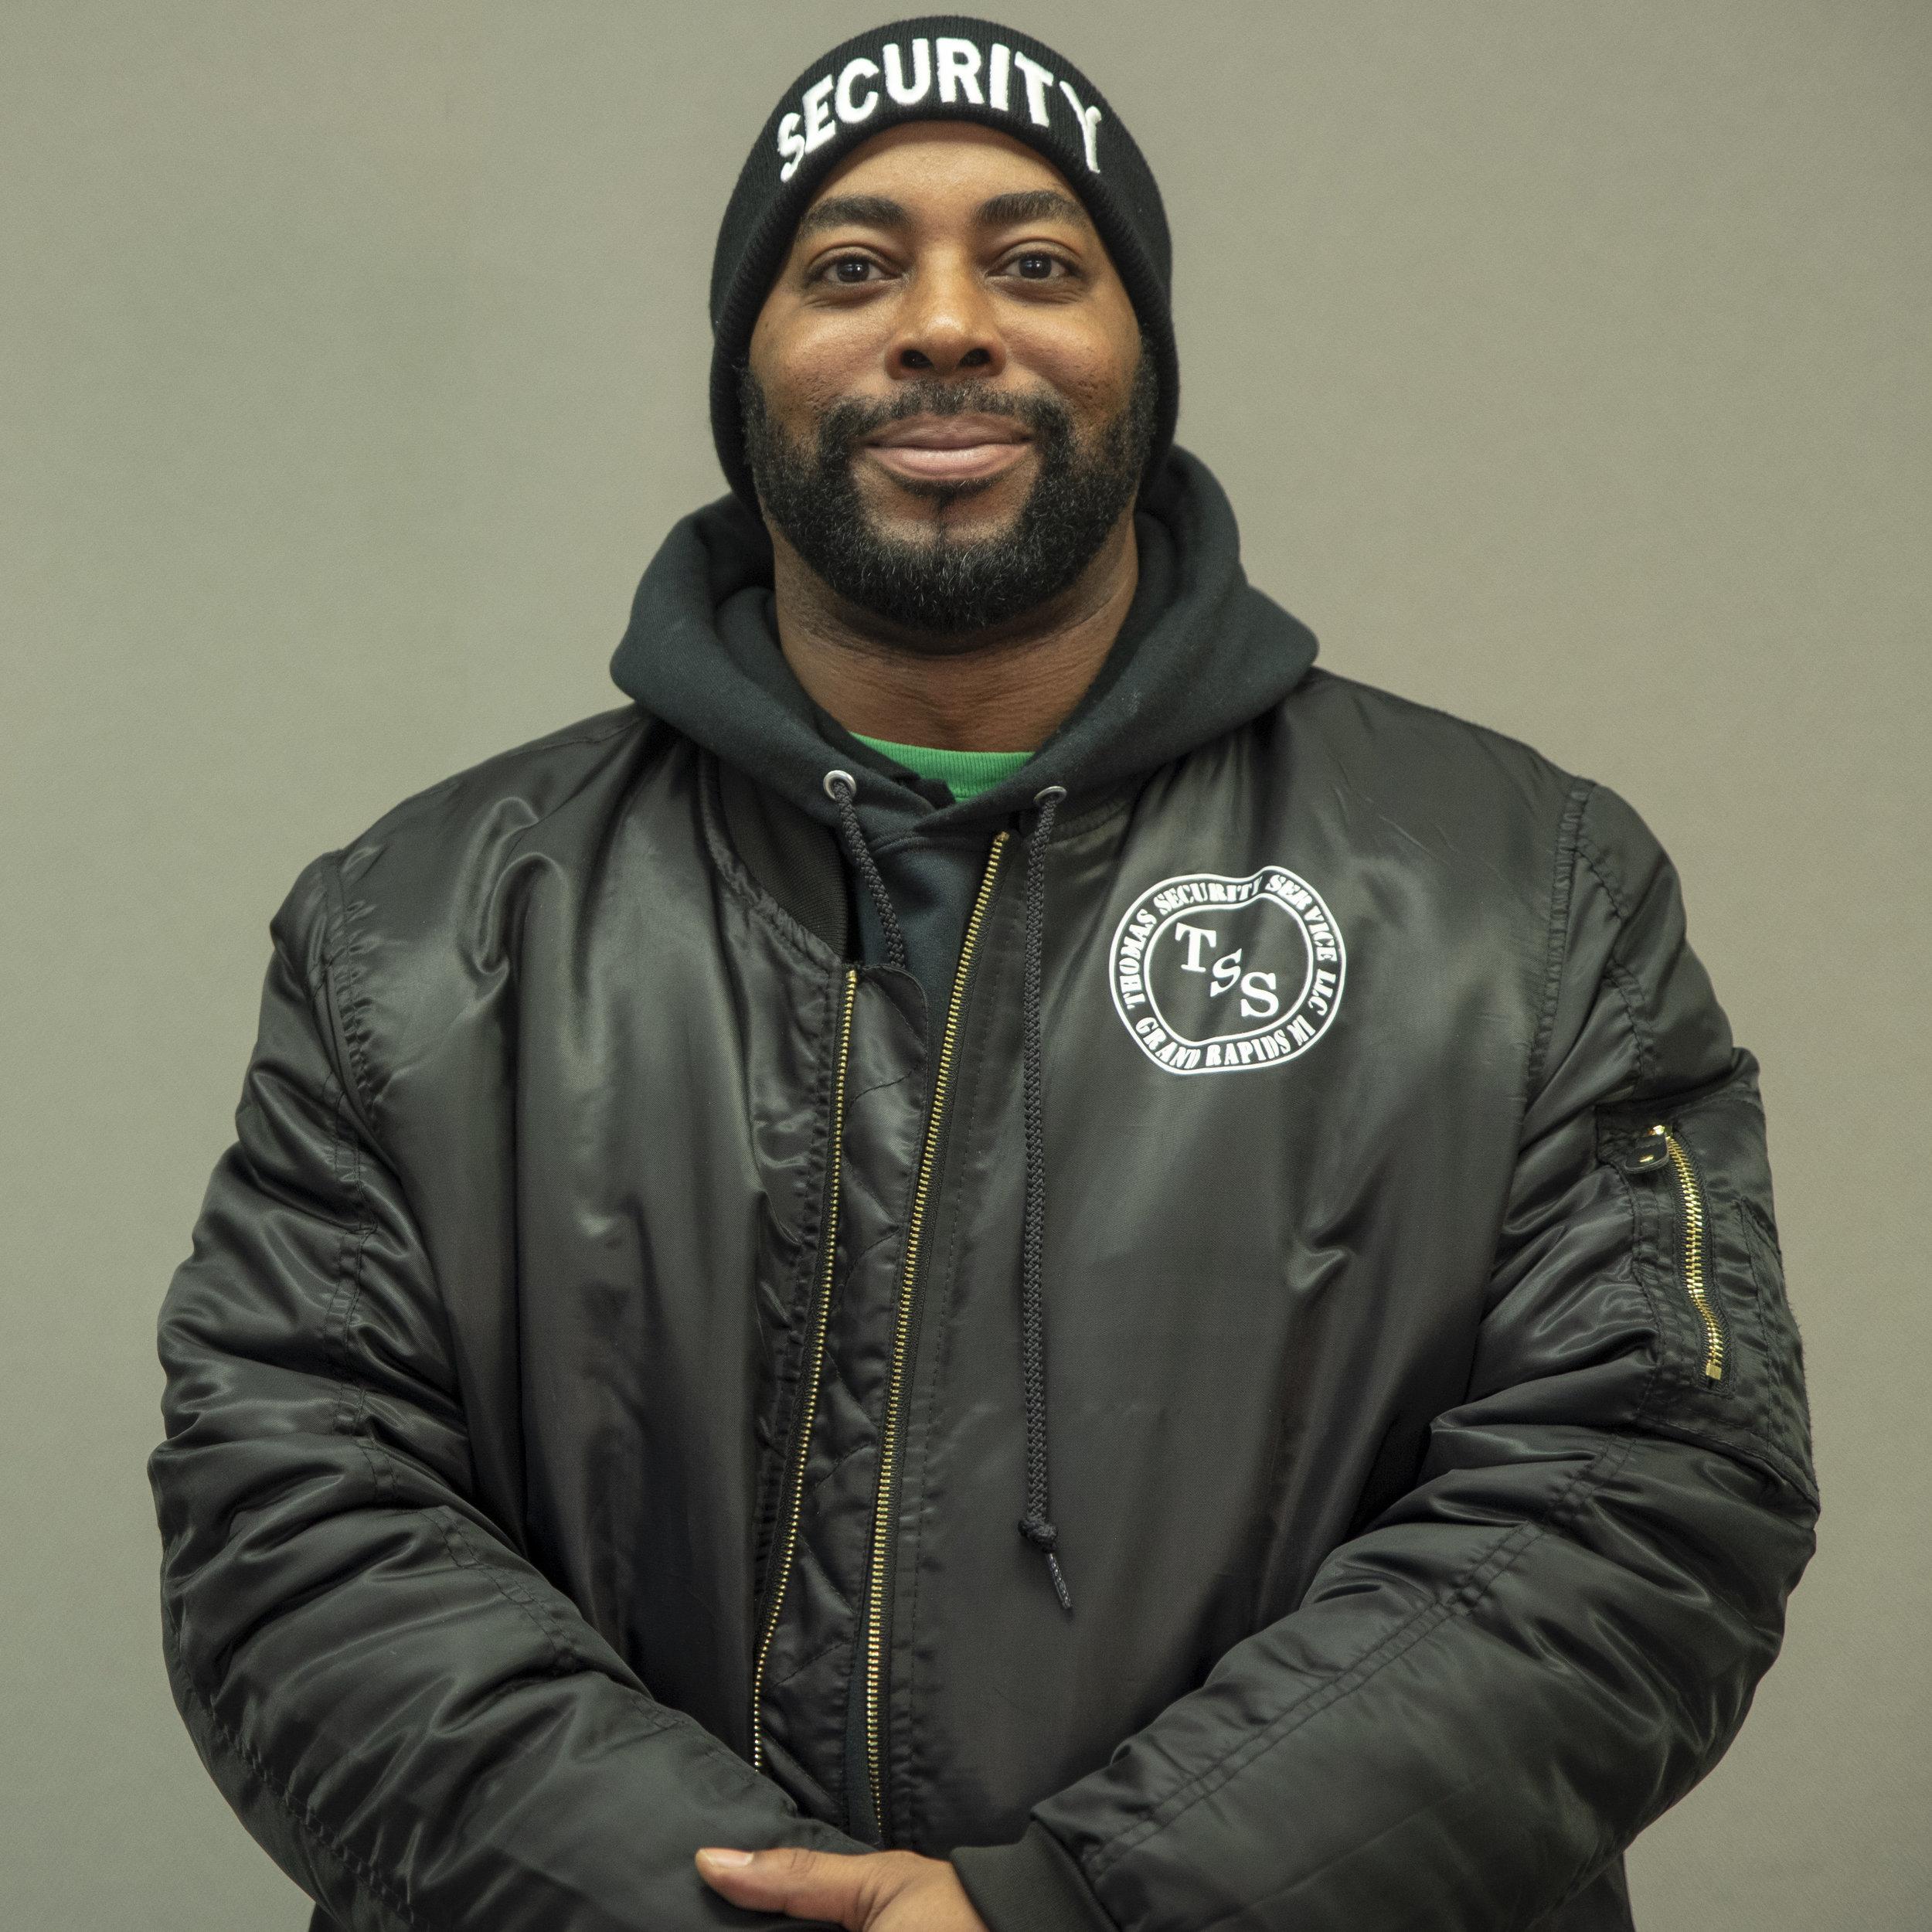 Chris Thomas - Security Manager